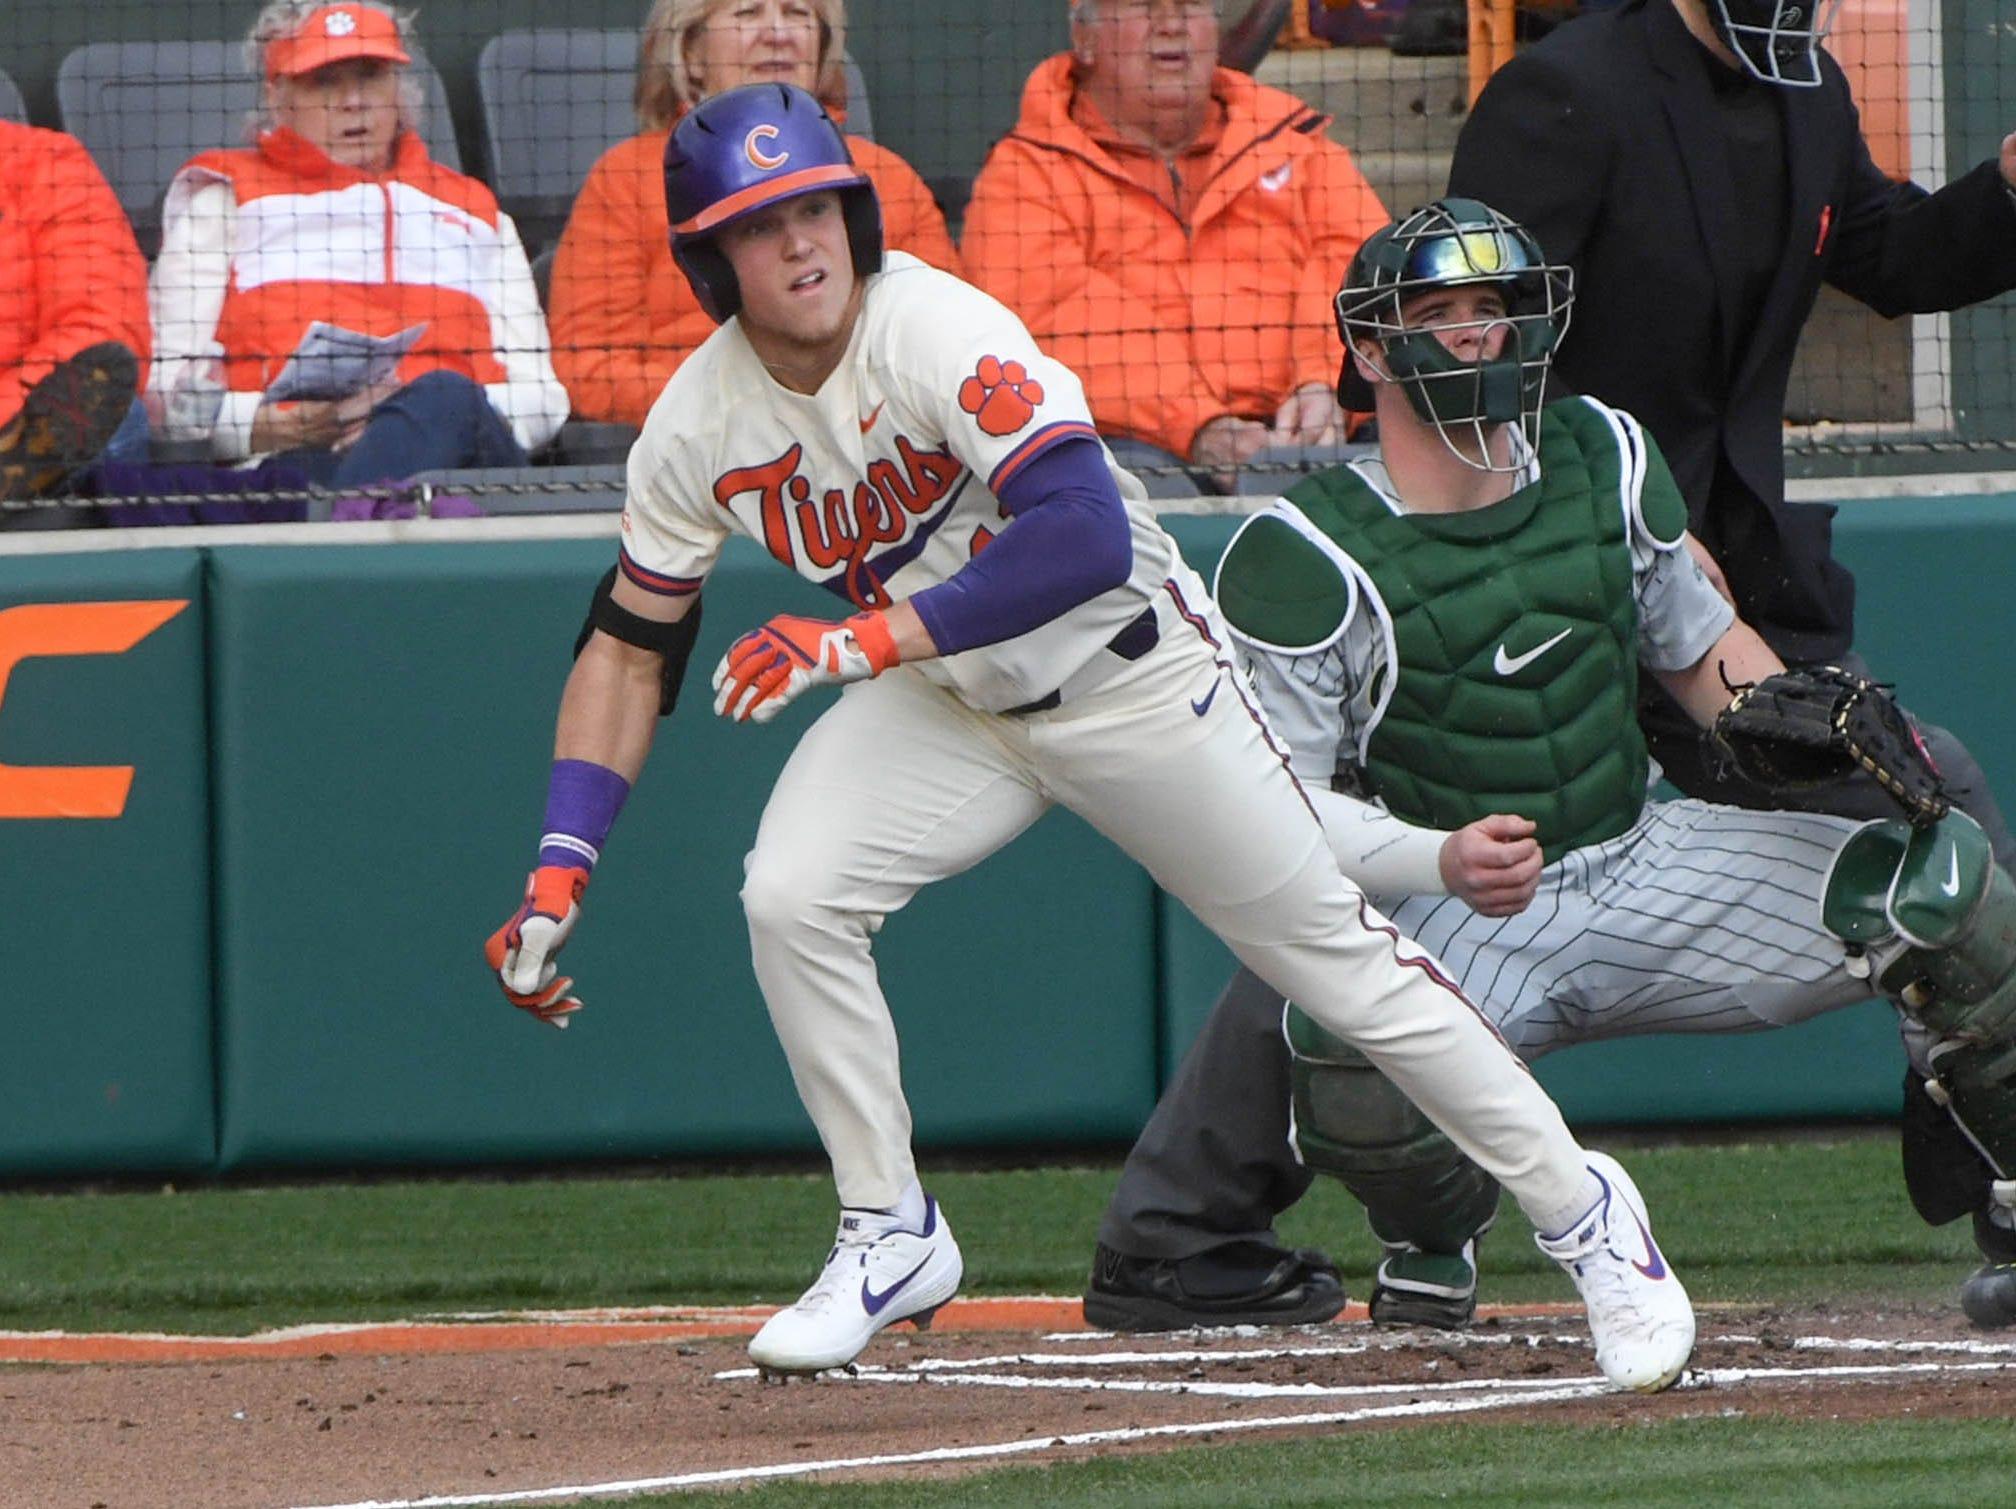 Clemson sophomore Michael Green(11) swings against Charlotte during the bottom of the first inning at Doug Kingsmore Stadium in Clemson Monday, February 18, 2019.